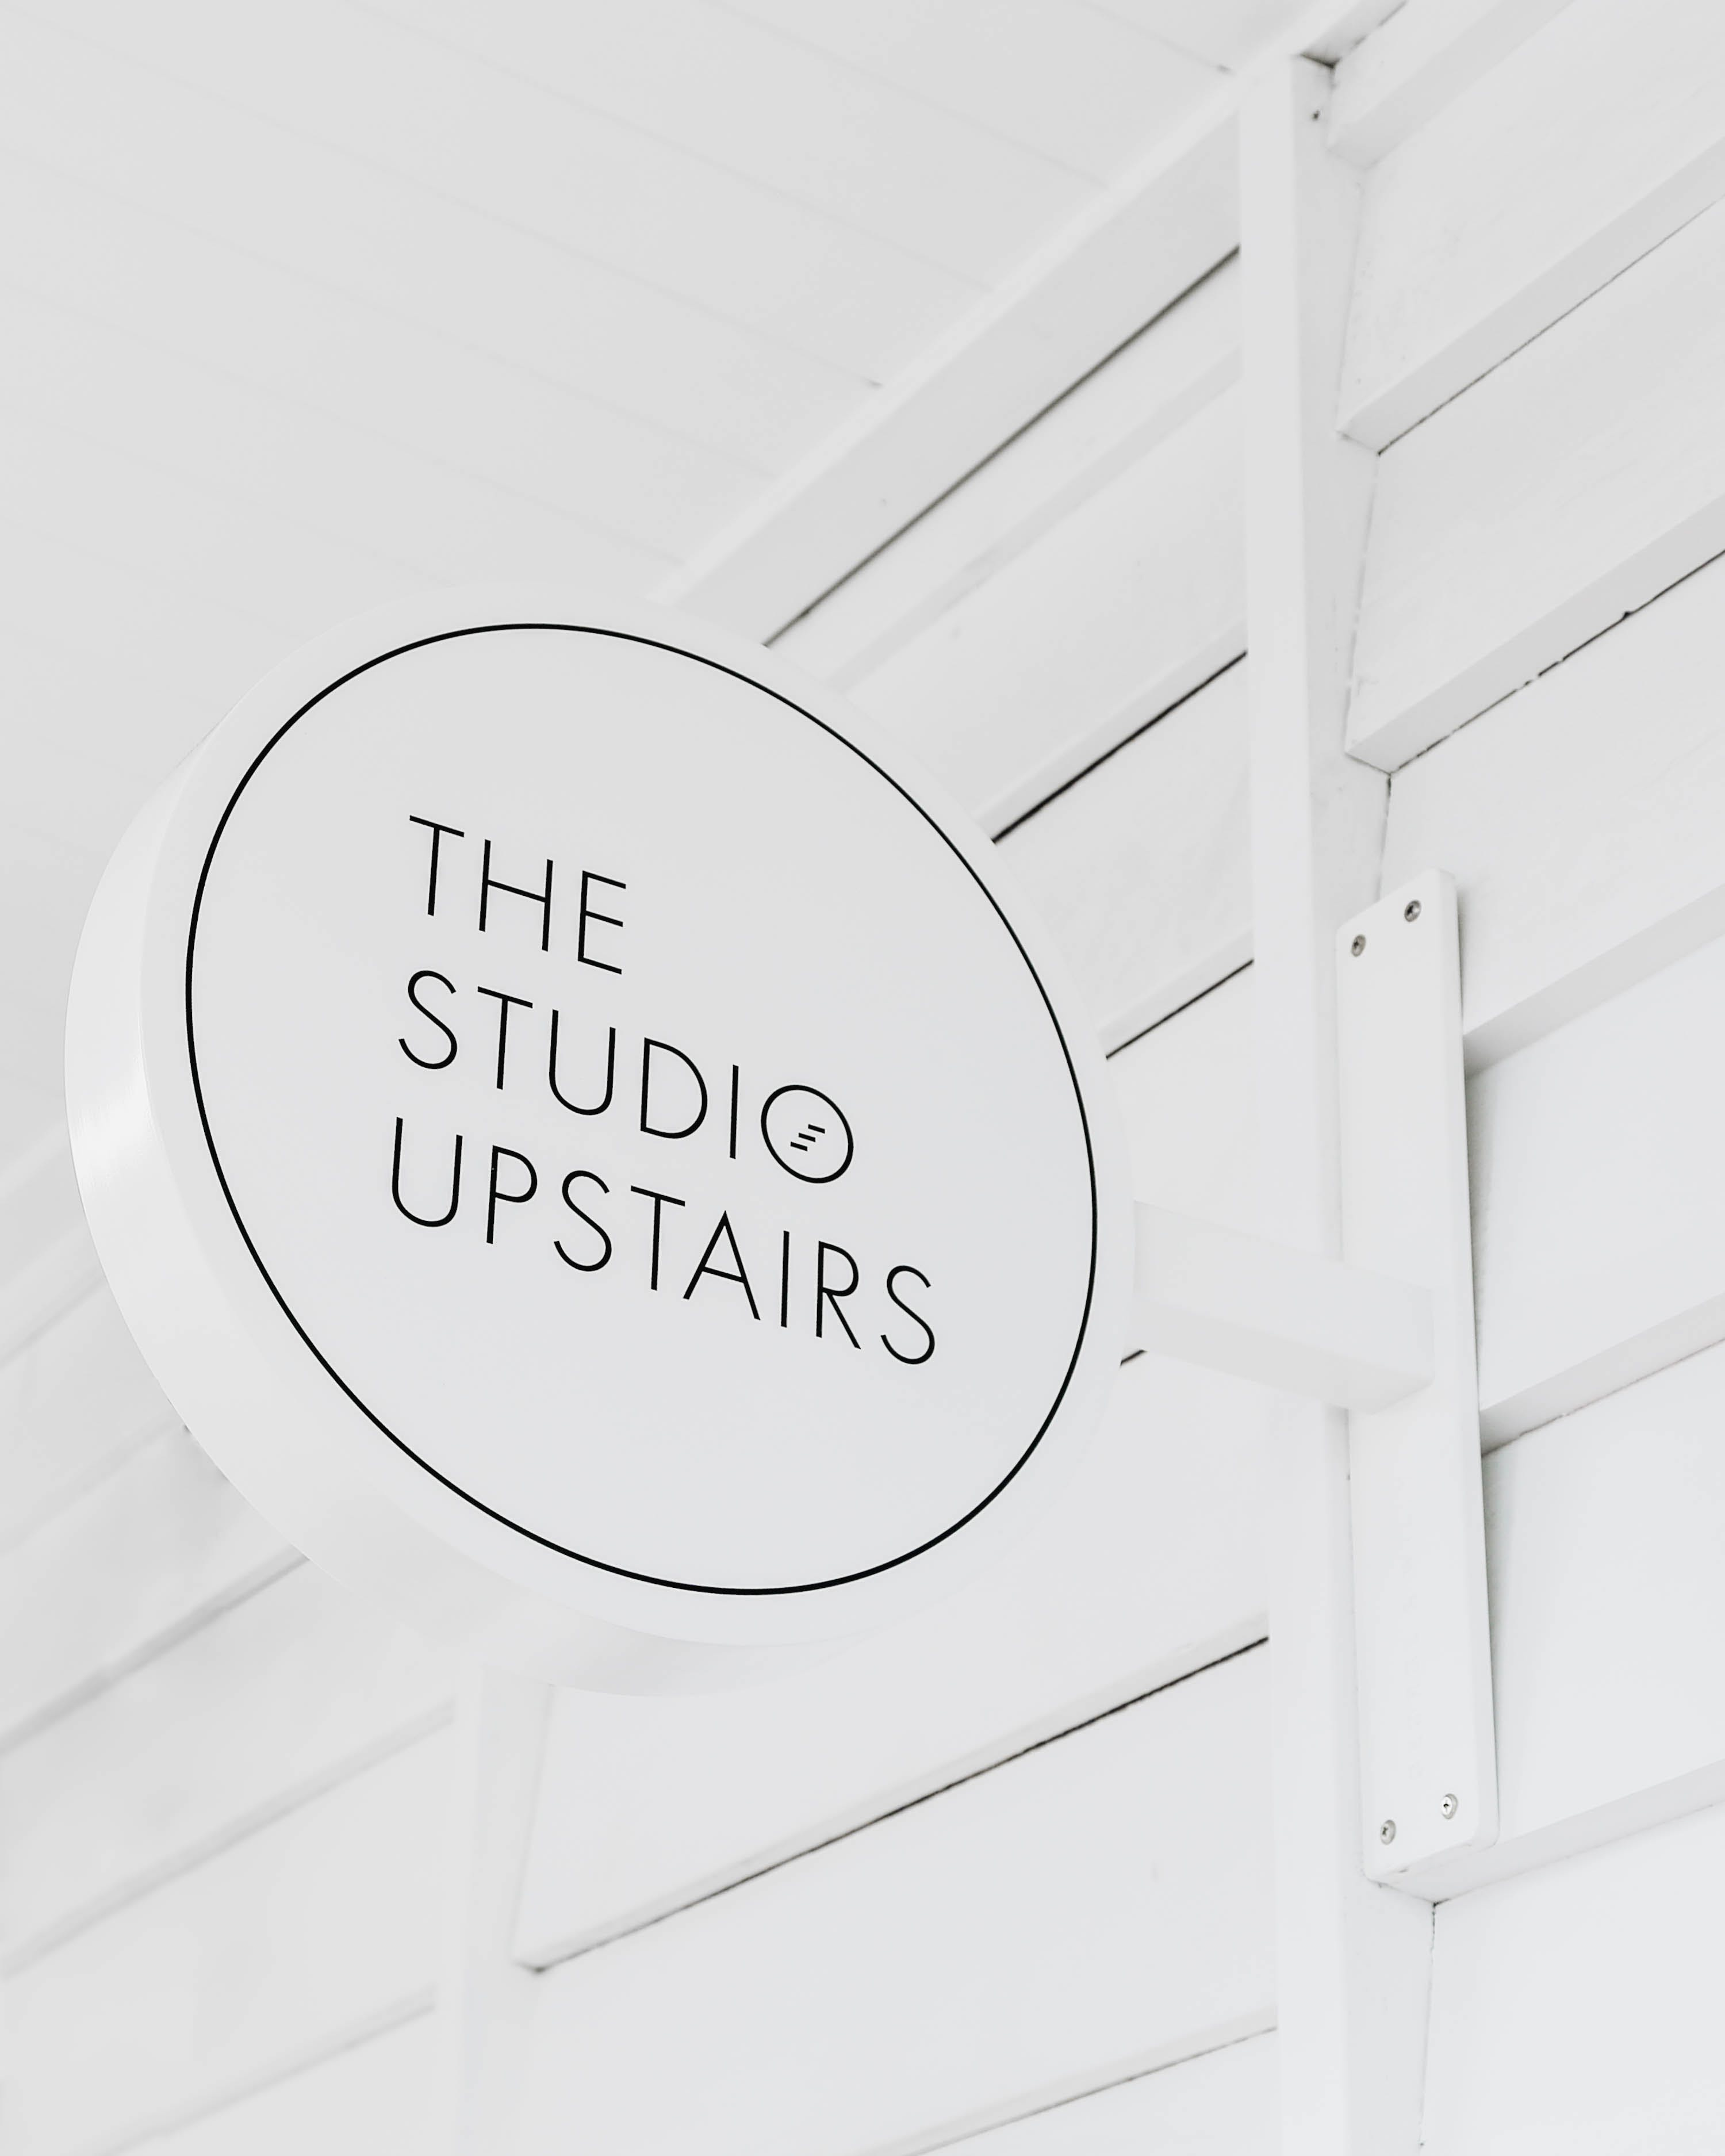 Creative studio at The Studio Upstairs, image 8